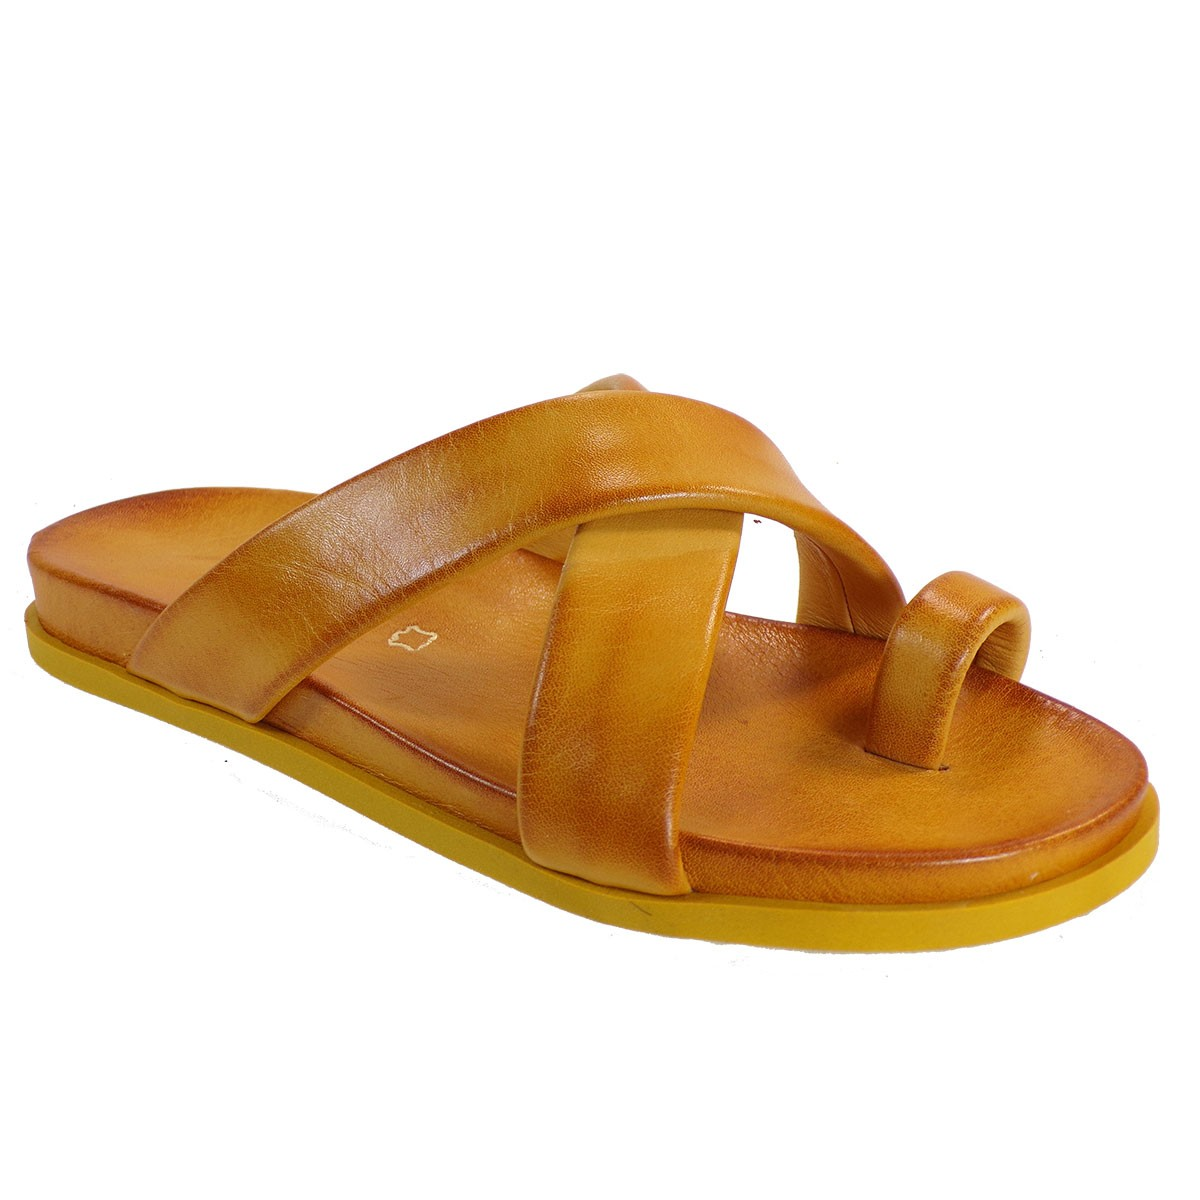 Fardoulis shoes Γυναικείες Παντόφλες 111-51 Κίτρινο Δέρμα